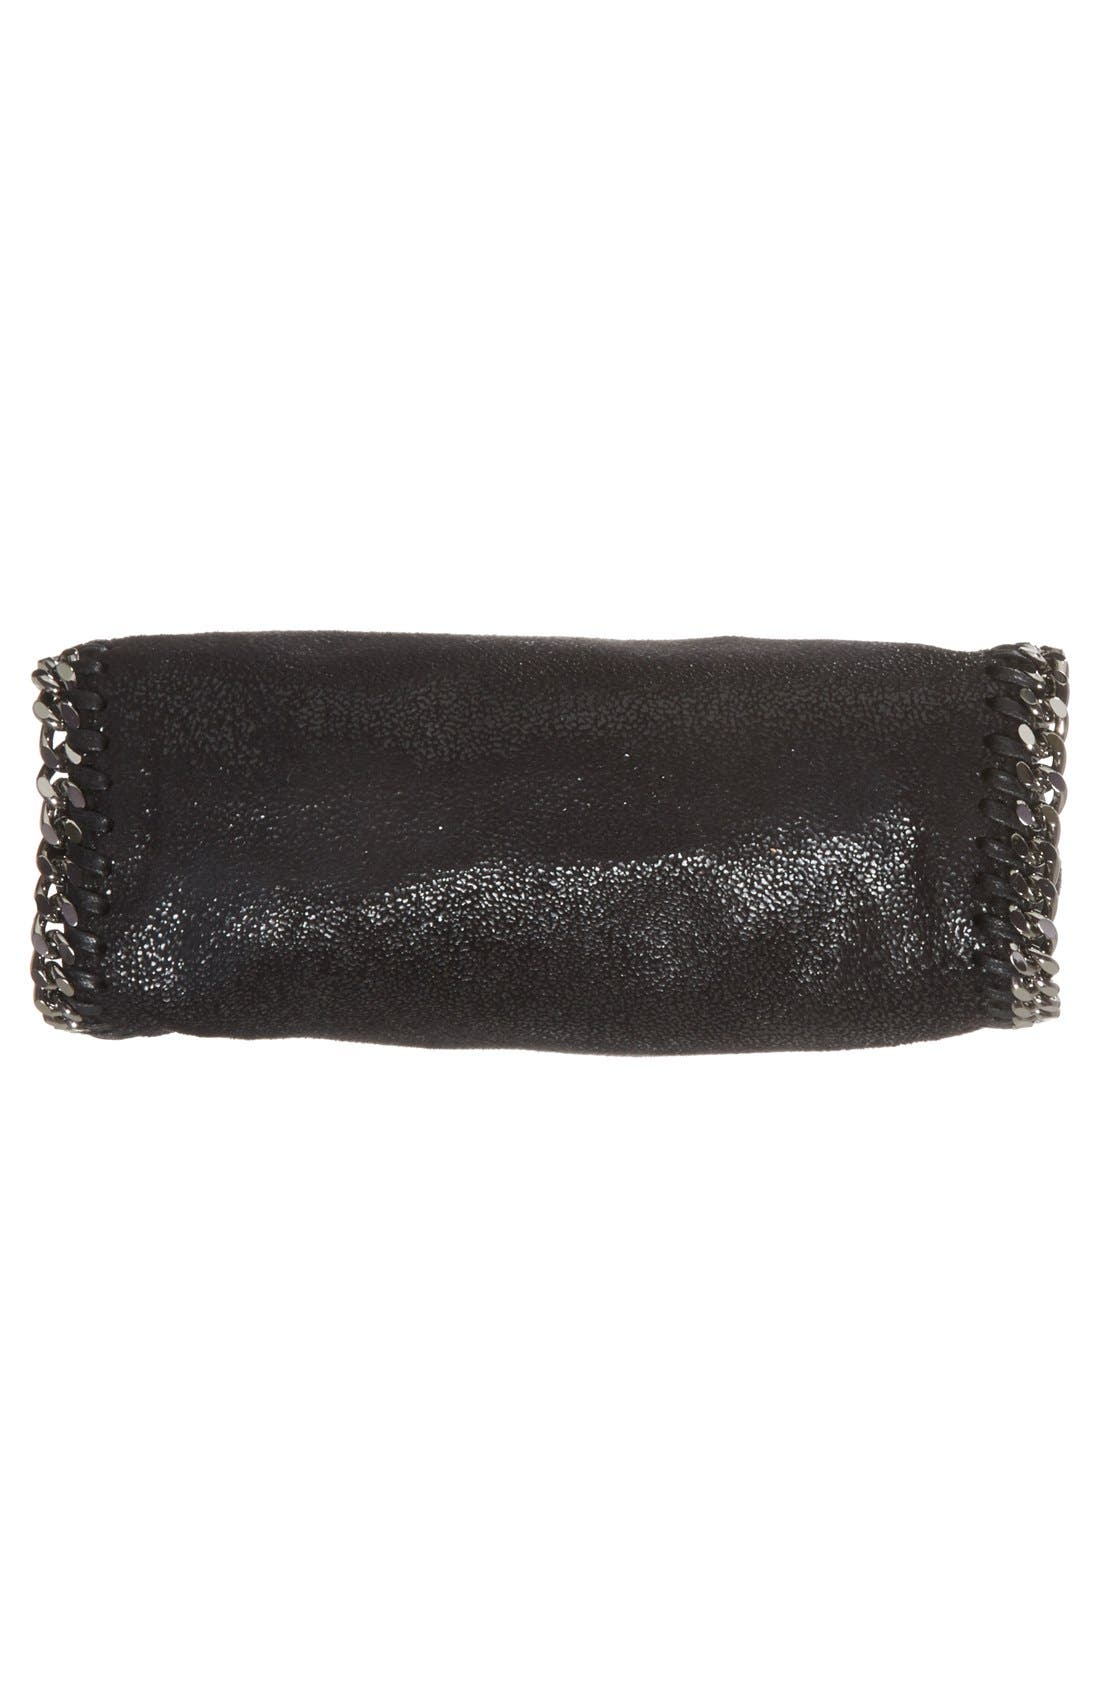 'Tiny Falabella' Faux Leather Crossbody Bag,                             Alternate thumbnail 6, color,                             Black